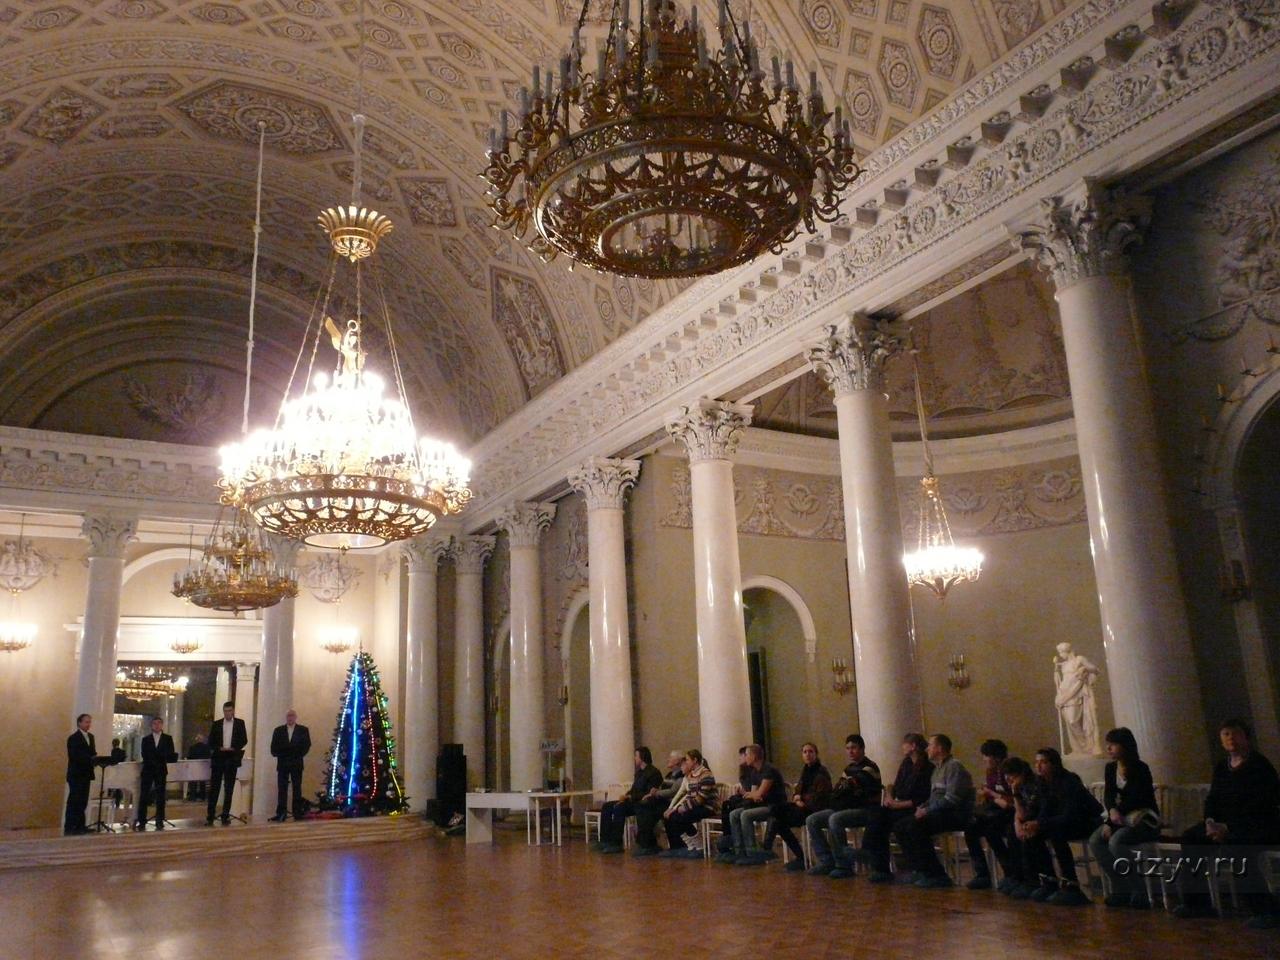 Картинки по запросу юсуповский дворец питер  описание